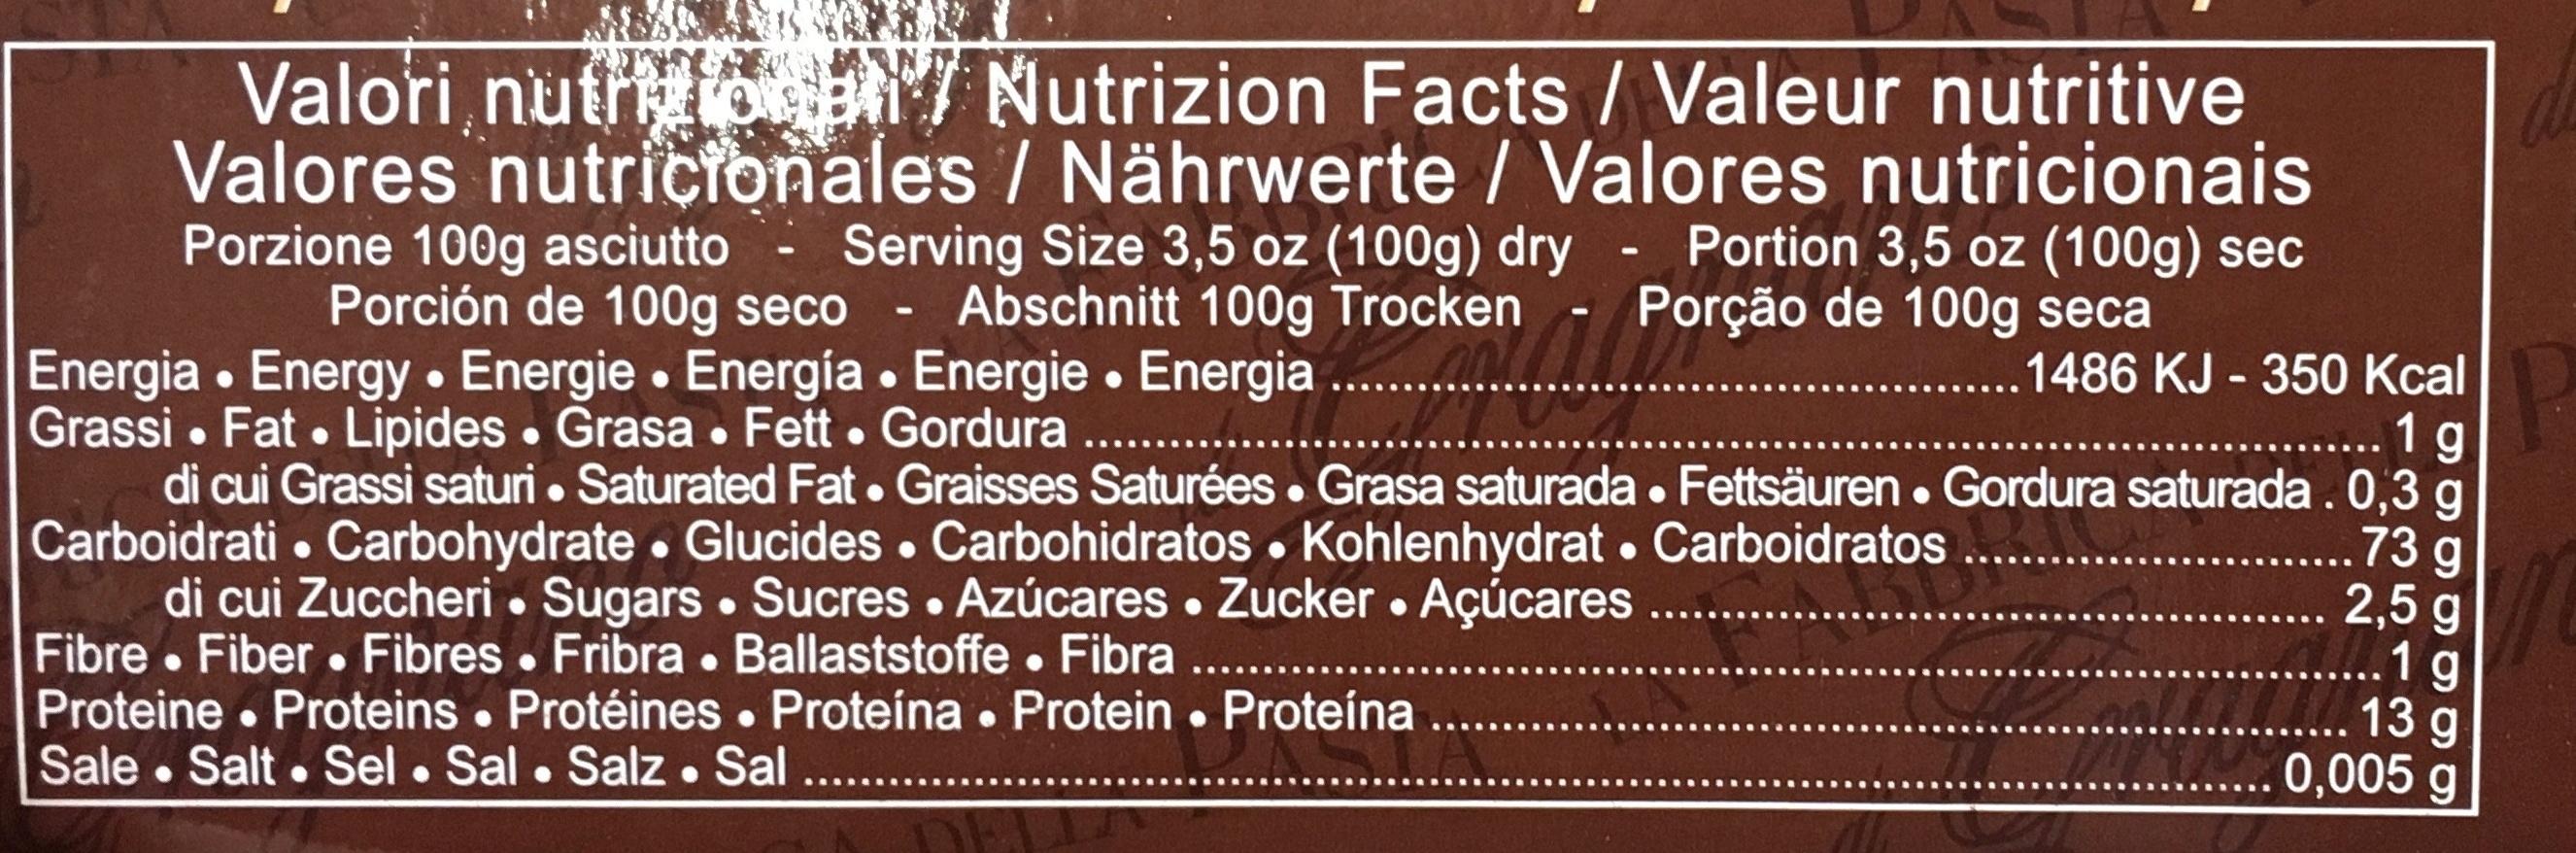 Caccavella (dans 4 terrines en terre cuite) - Informations nutritionnelles - fr